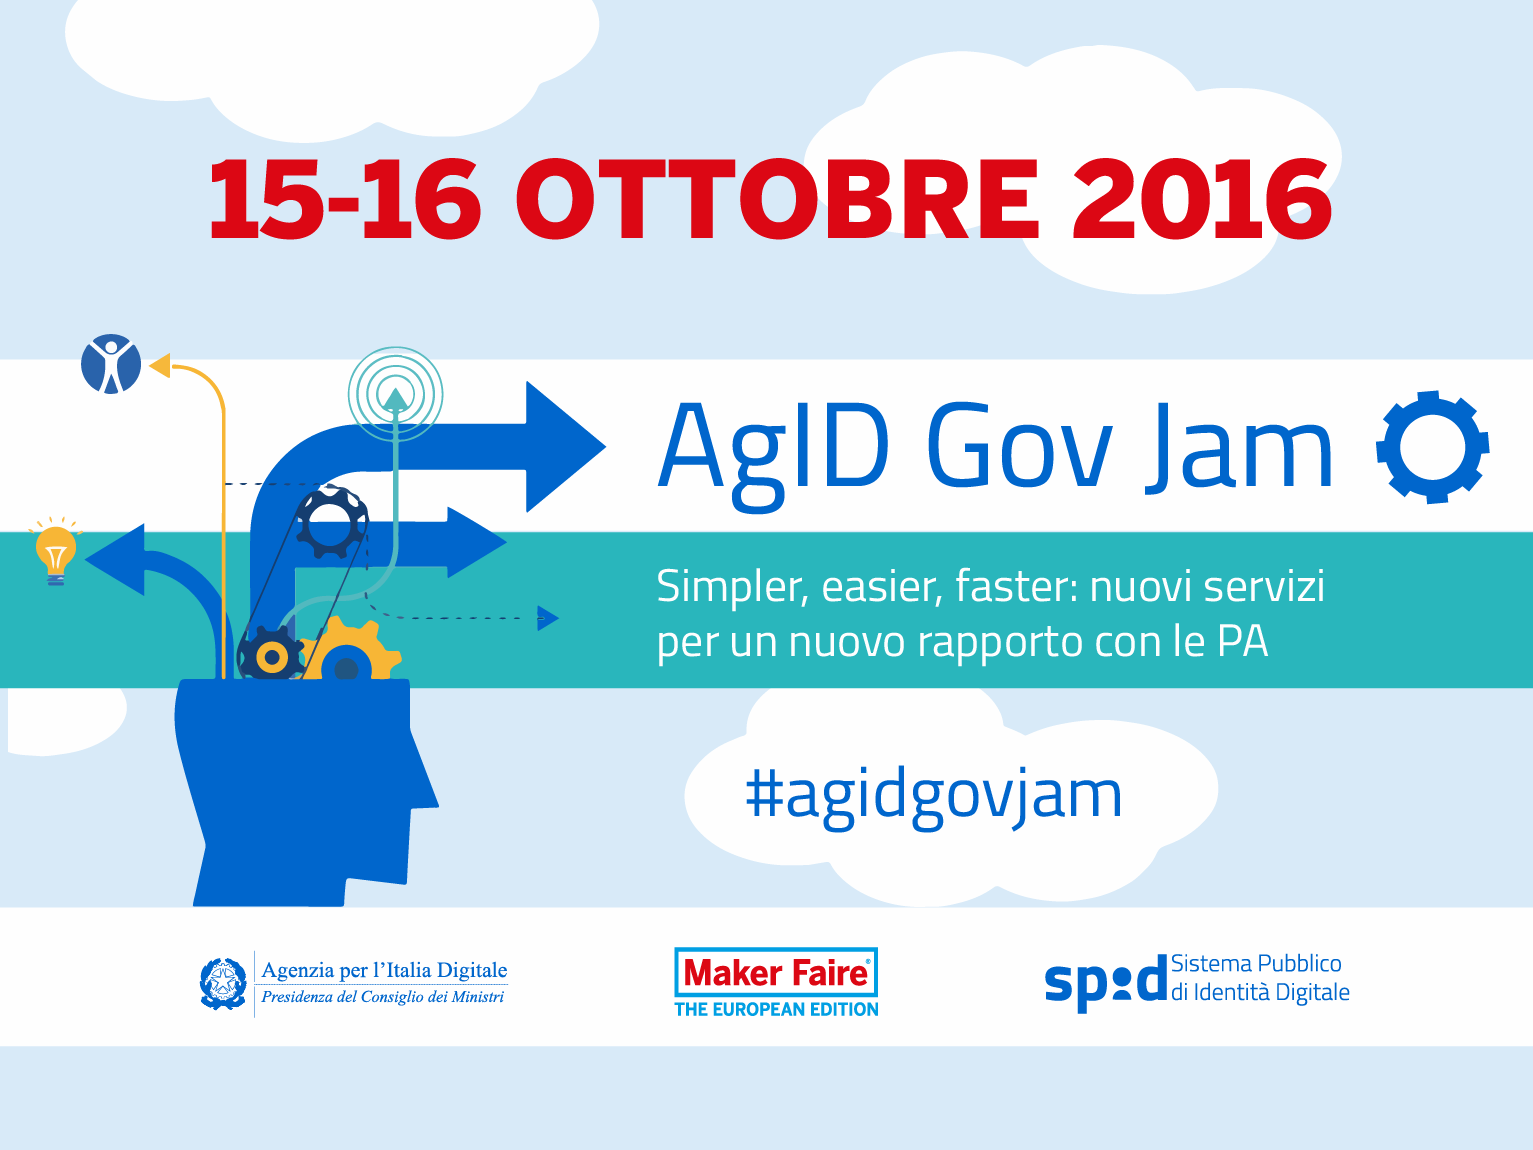 agid_gov_jam